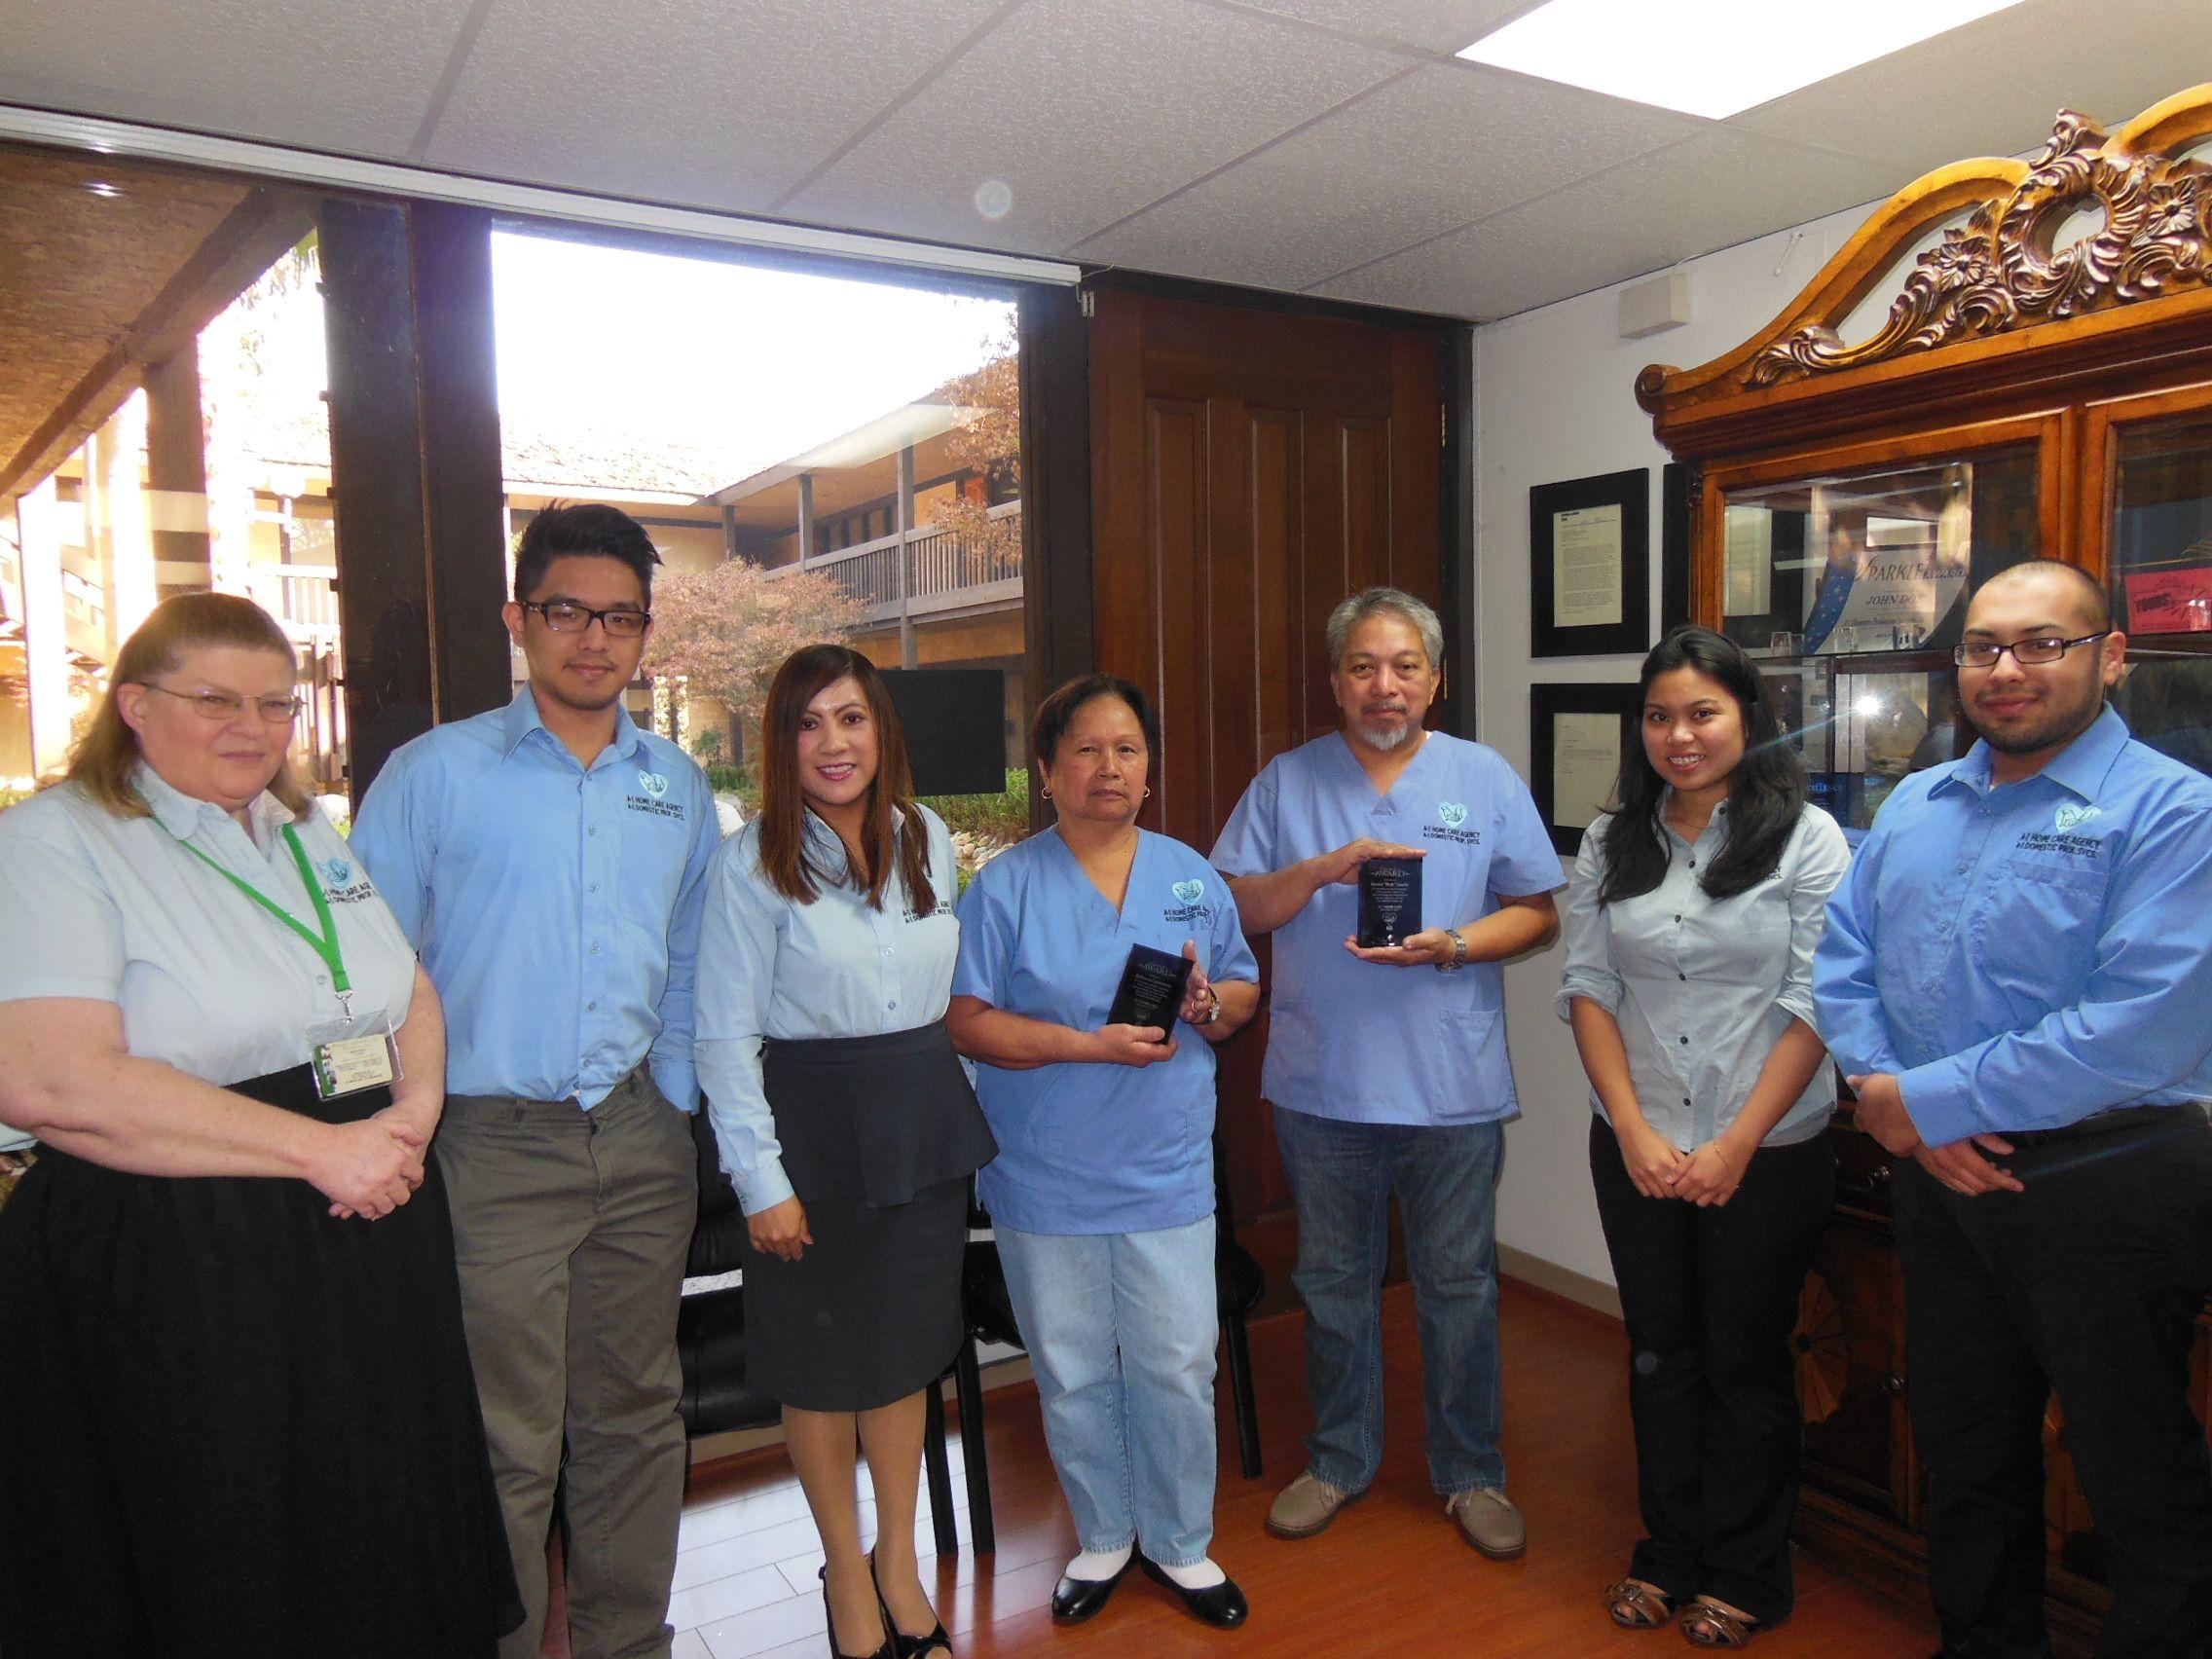 Our Staff Congratulating Enrico Caedo And Rebecca Cashmore